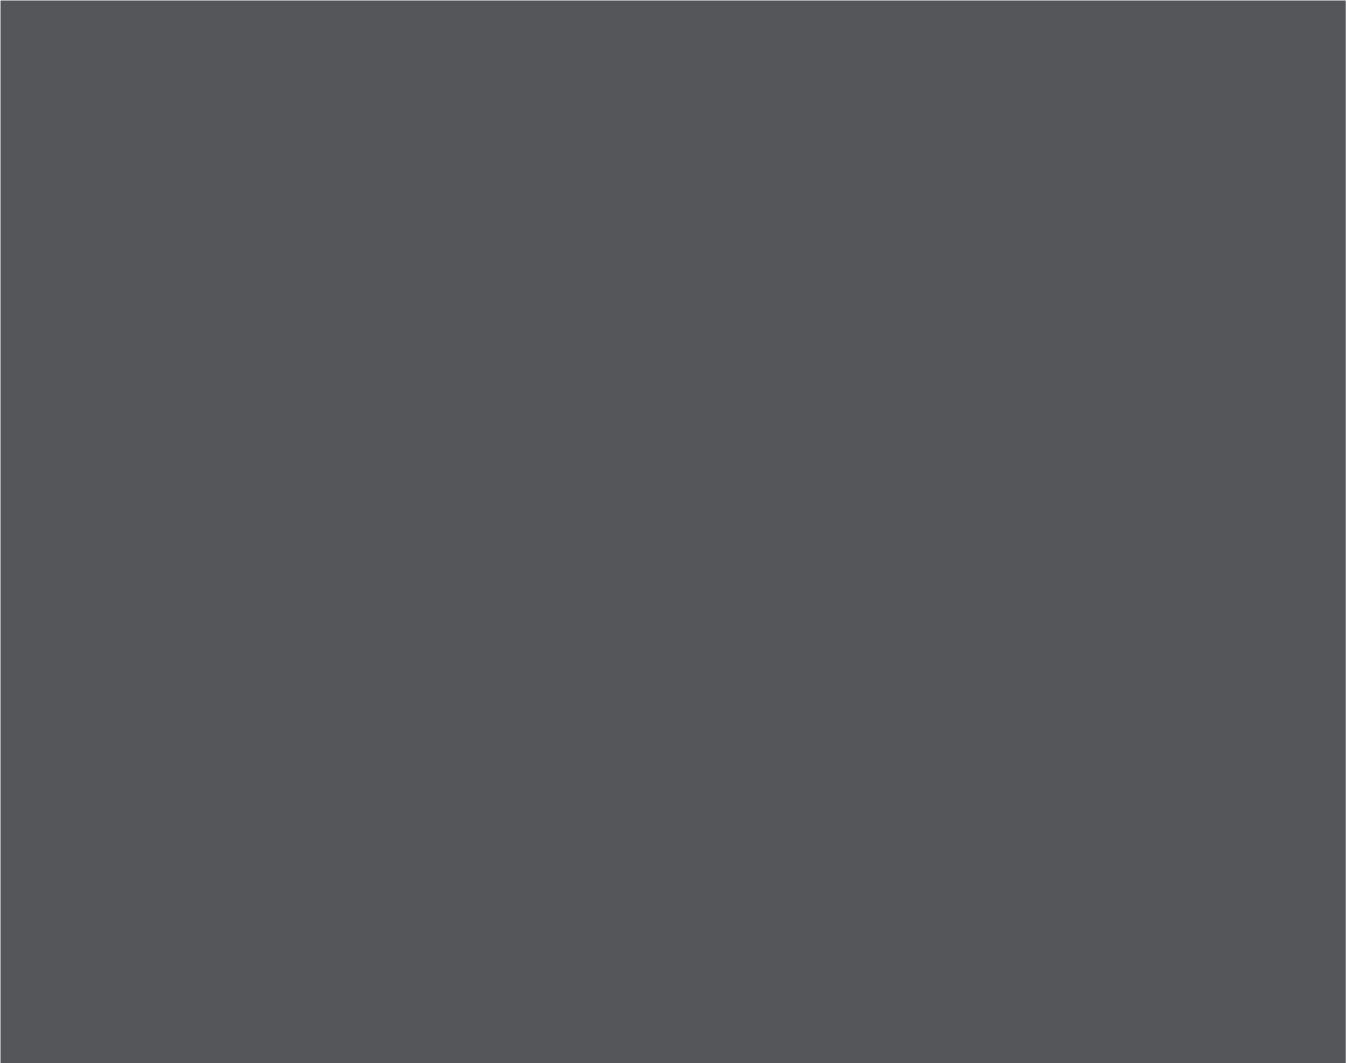 Pantone  Cool Gray 11 C  CMYK: 44 / 34 / 22 / 77  RGB: 83 / 86 / 90  Hex: #53565A